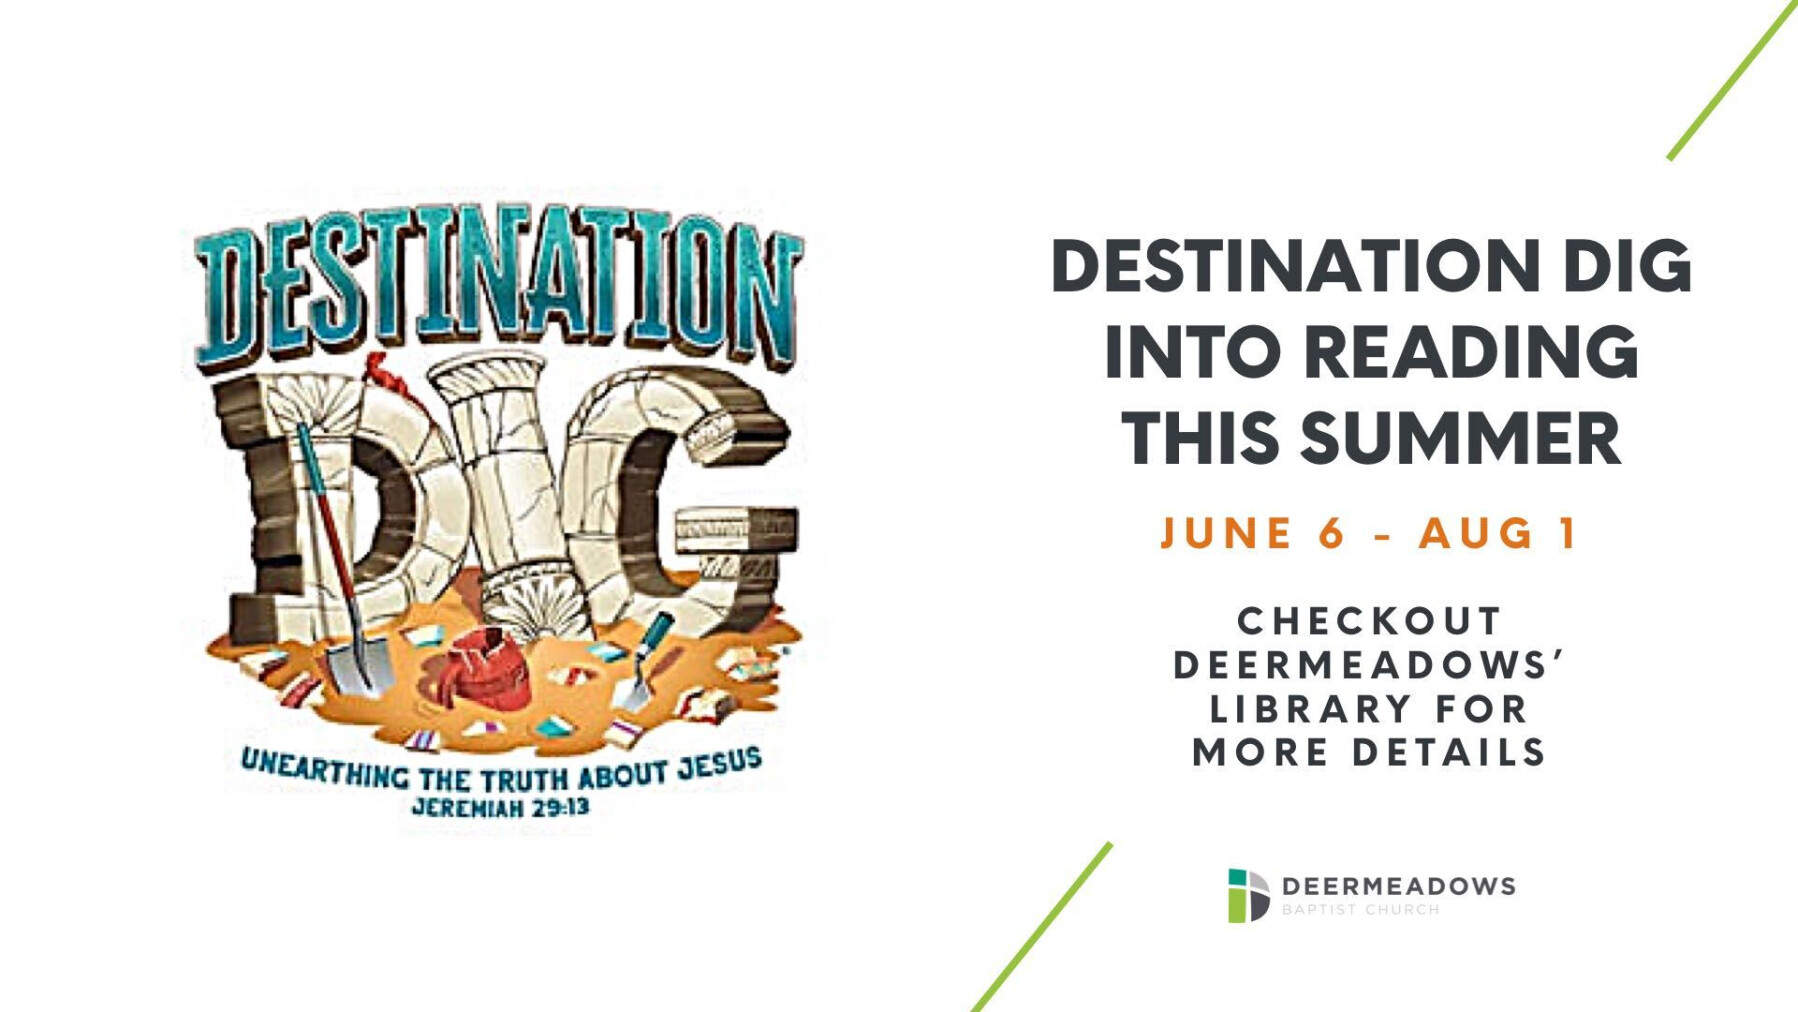 Destination Dig Into Reading